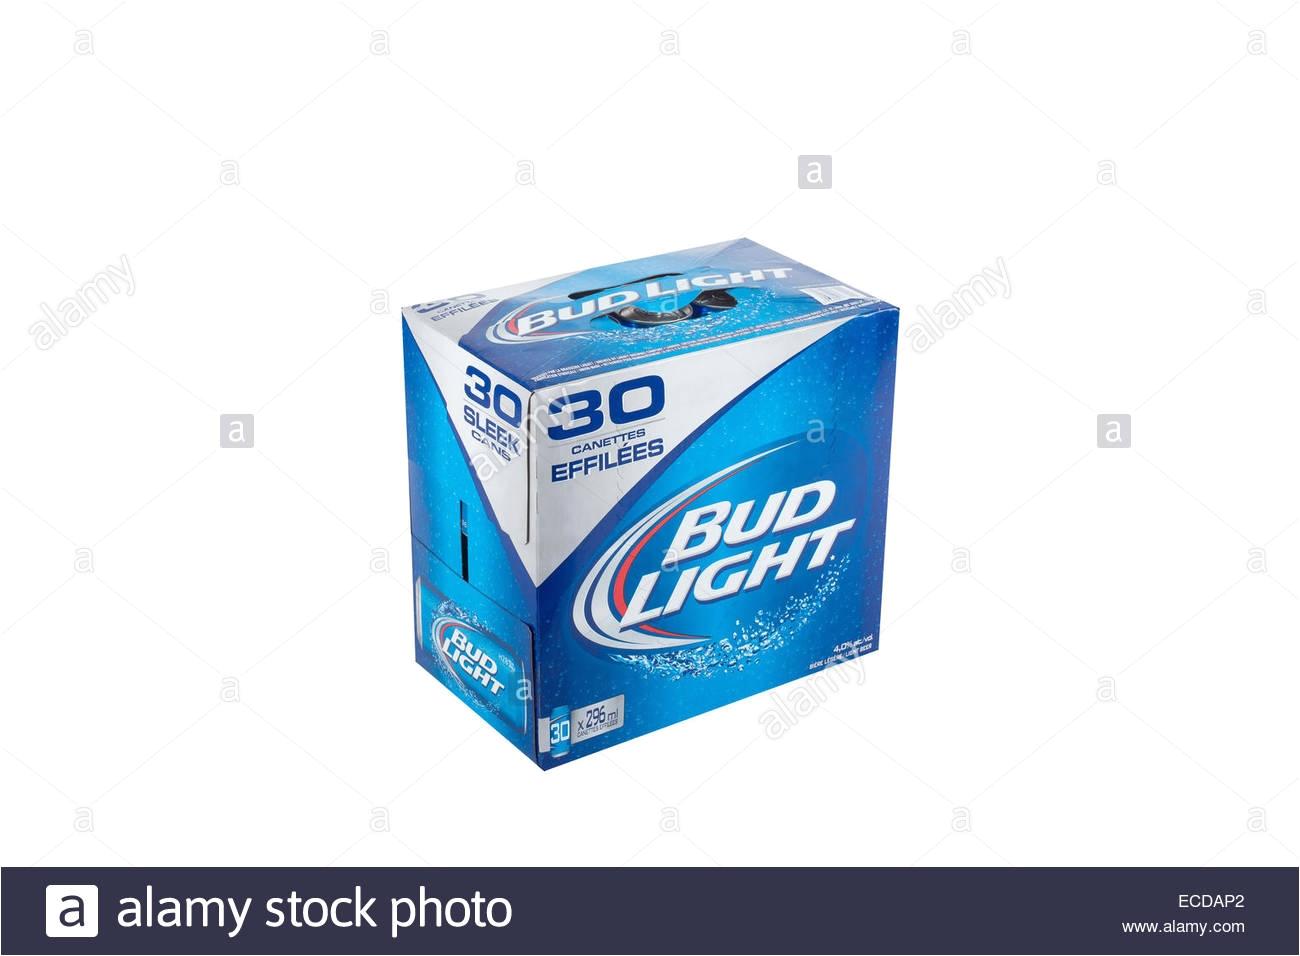 30 Pack Bud Light Budweiser Beer Can Stock Photos Budweiser Beer Can Stock Images